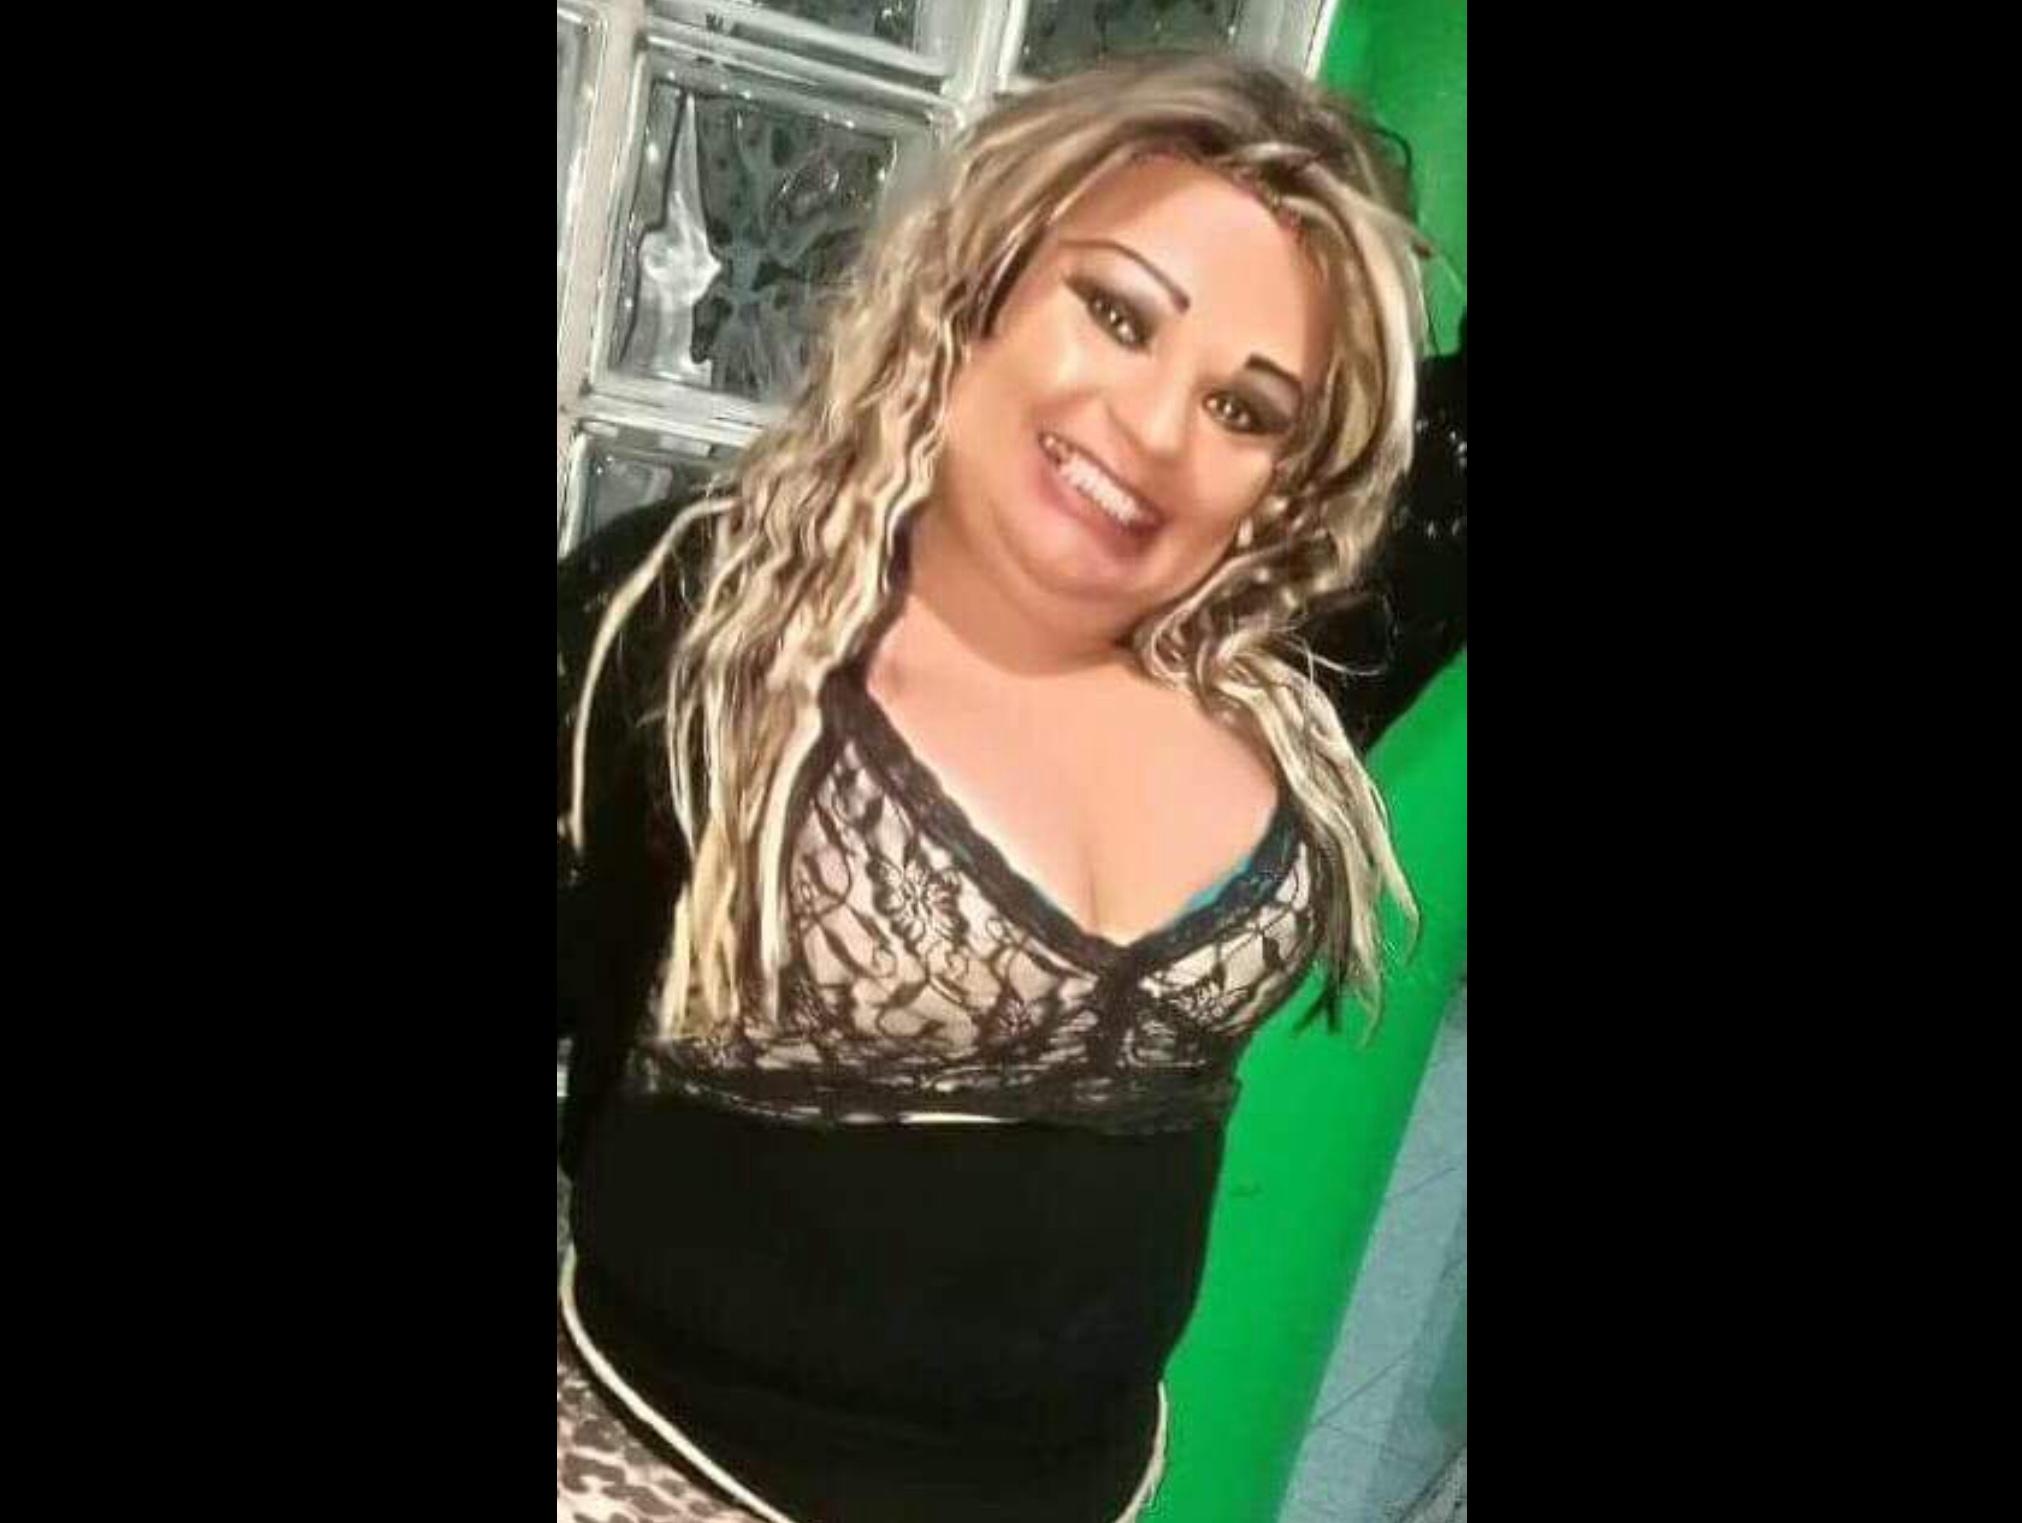 Balean a chica trans en Toluca, murió